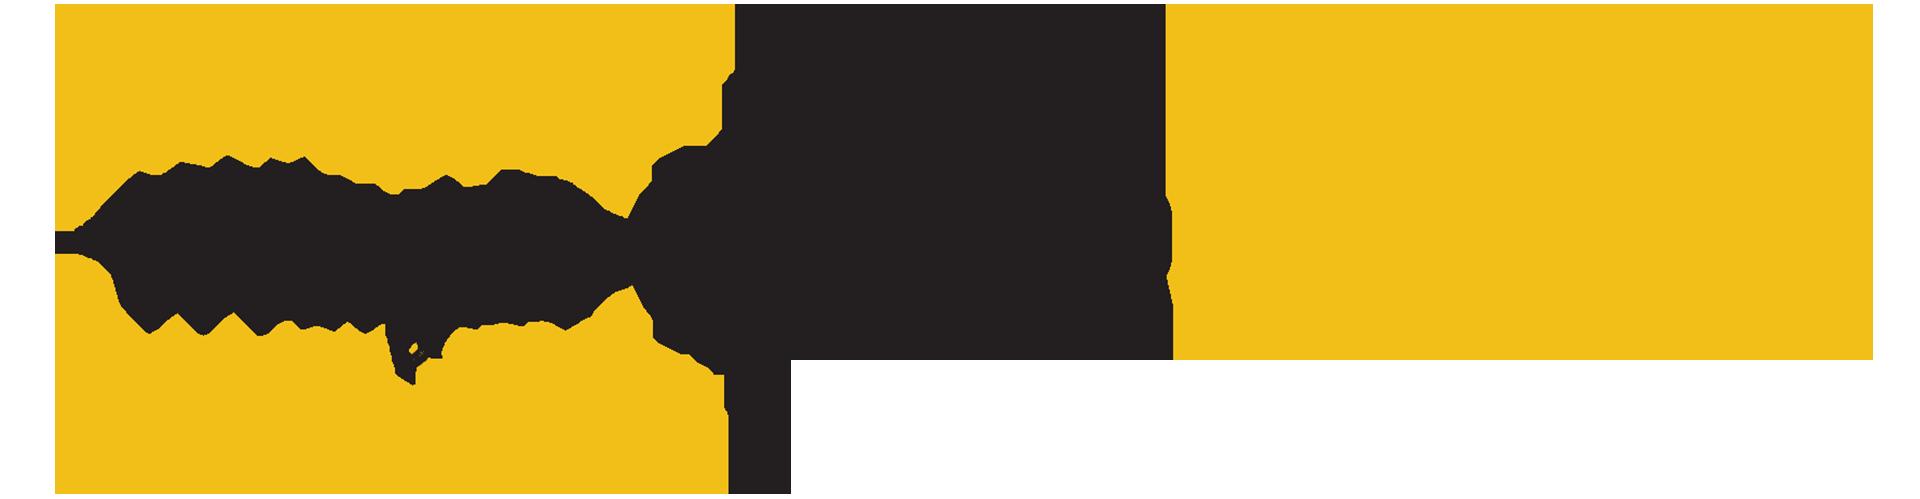 magic-maker-podcast